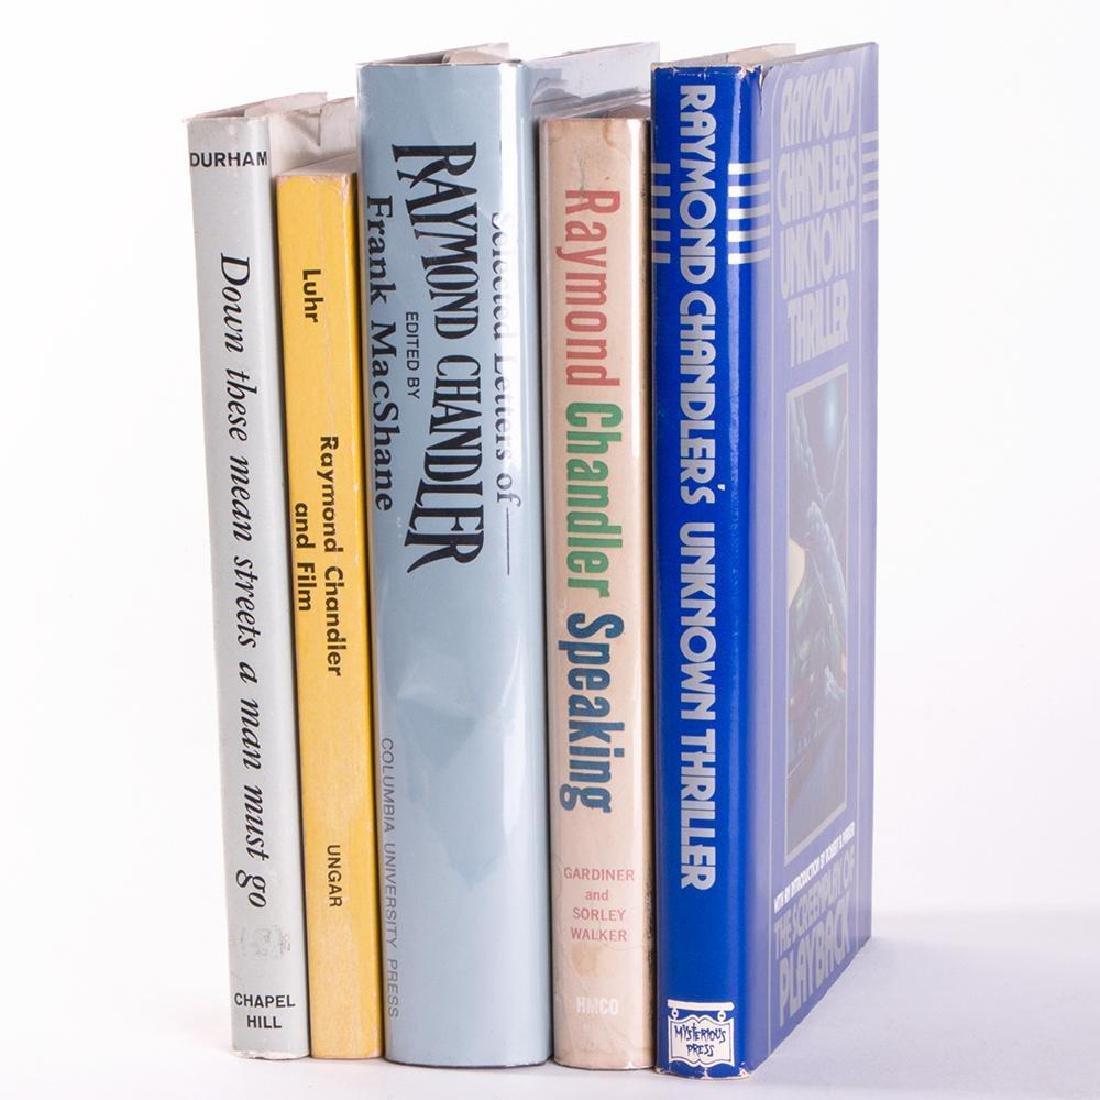 Five works, Raymond Chandler